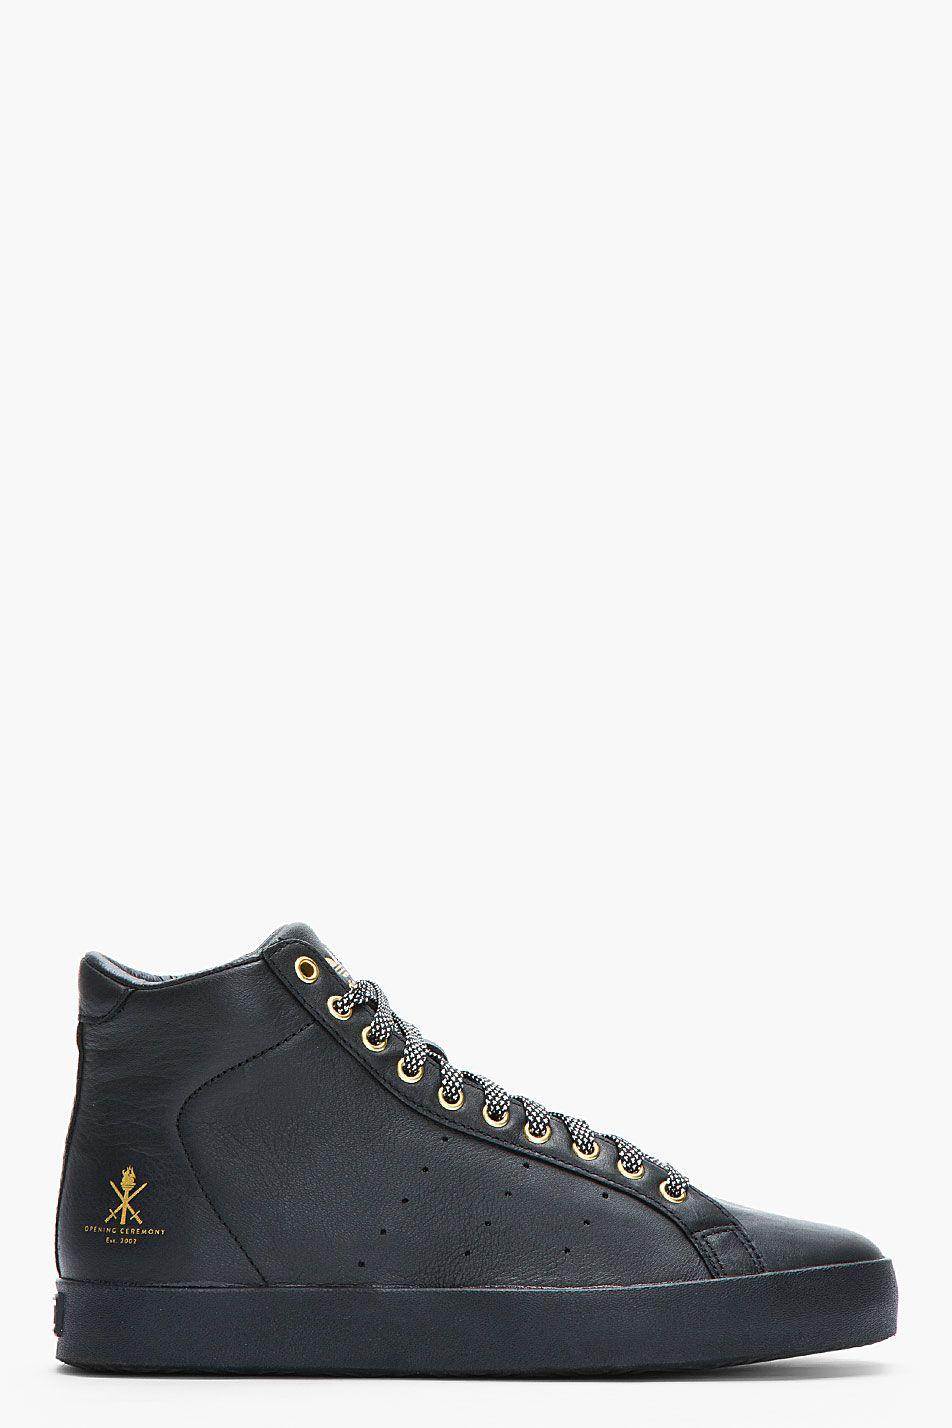 sale retailer d76c7 2d452 adidas Originals By O.C. Black And Gold Leather Rod Laver Vintage Mid-tops  for men   SSENSE